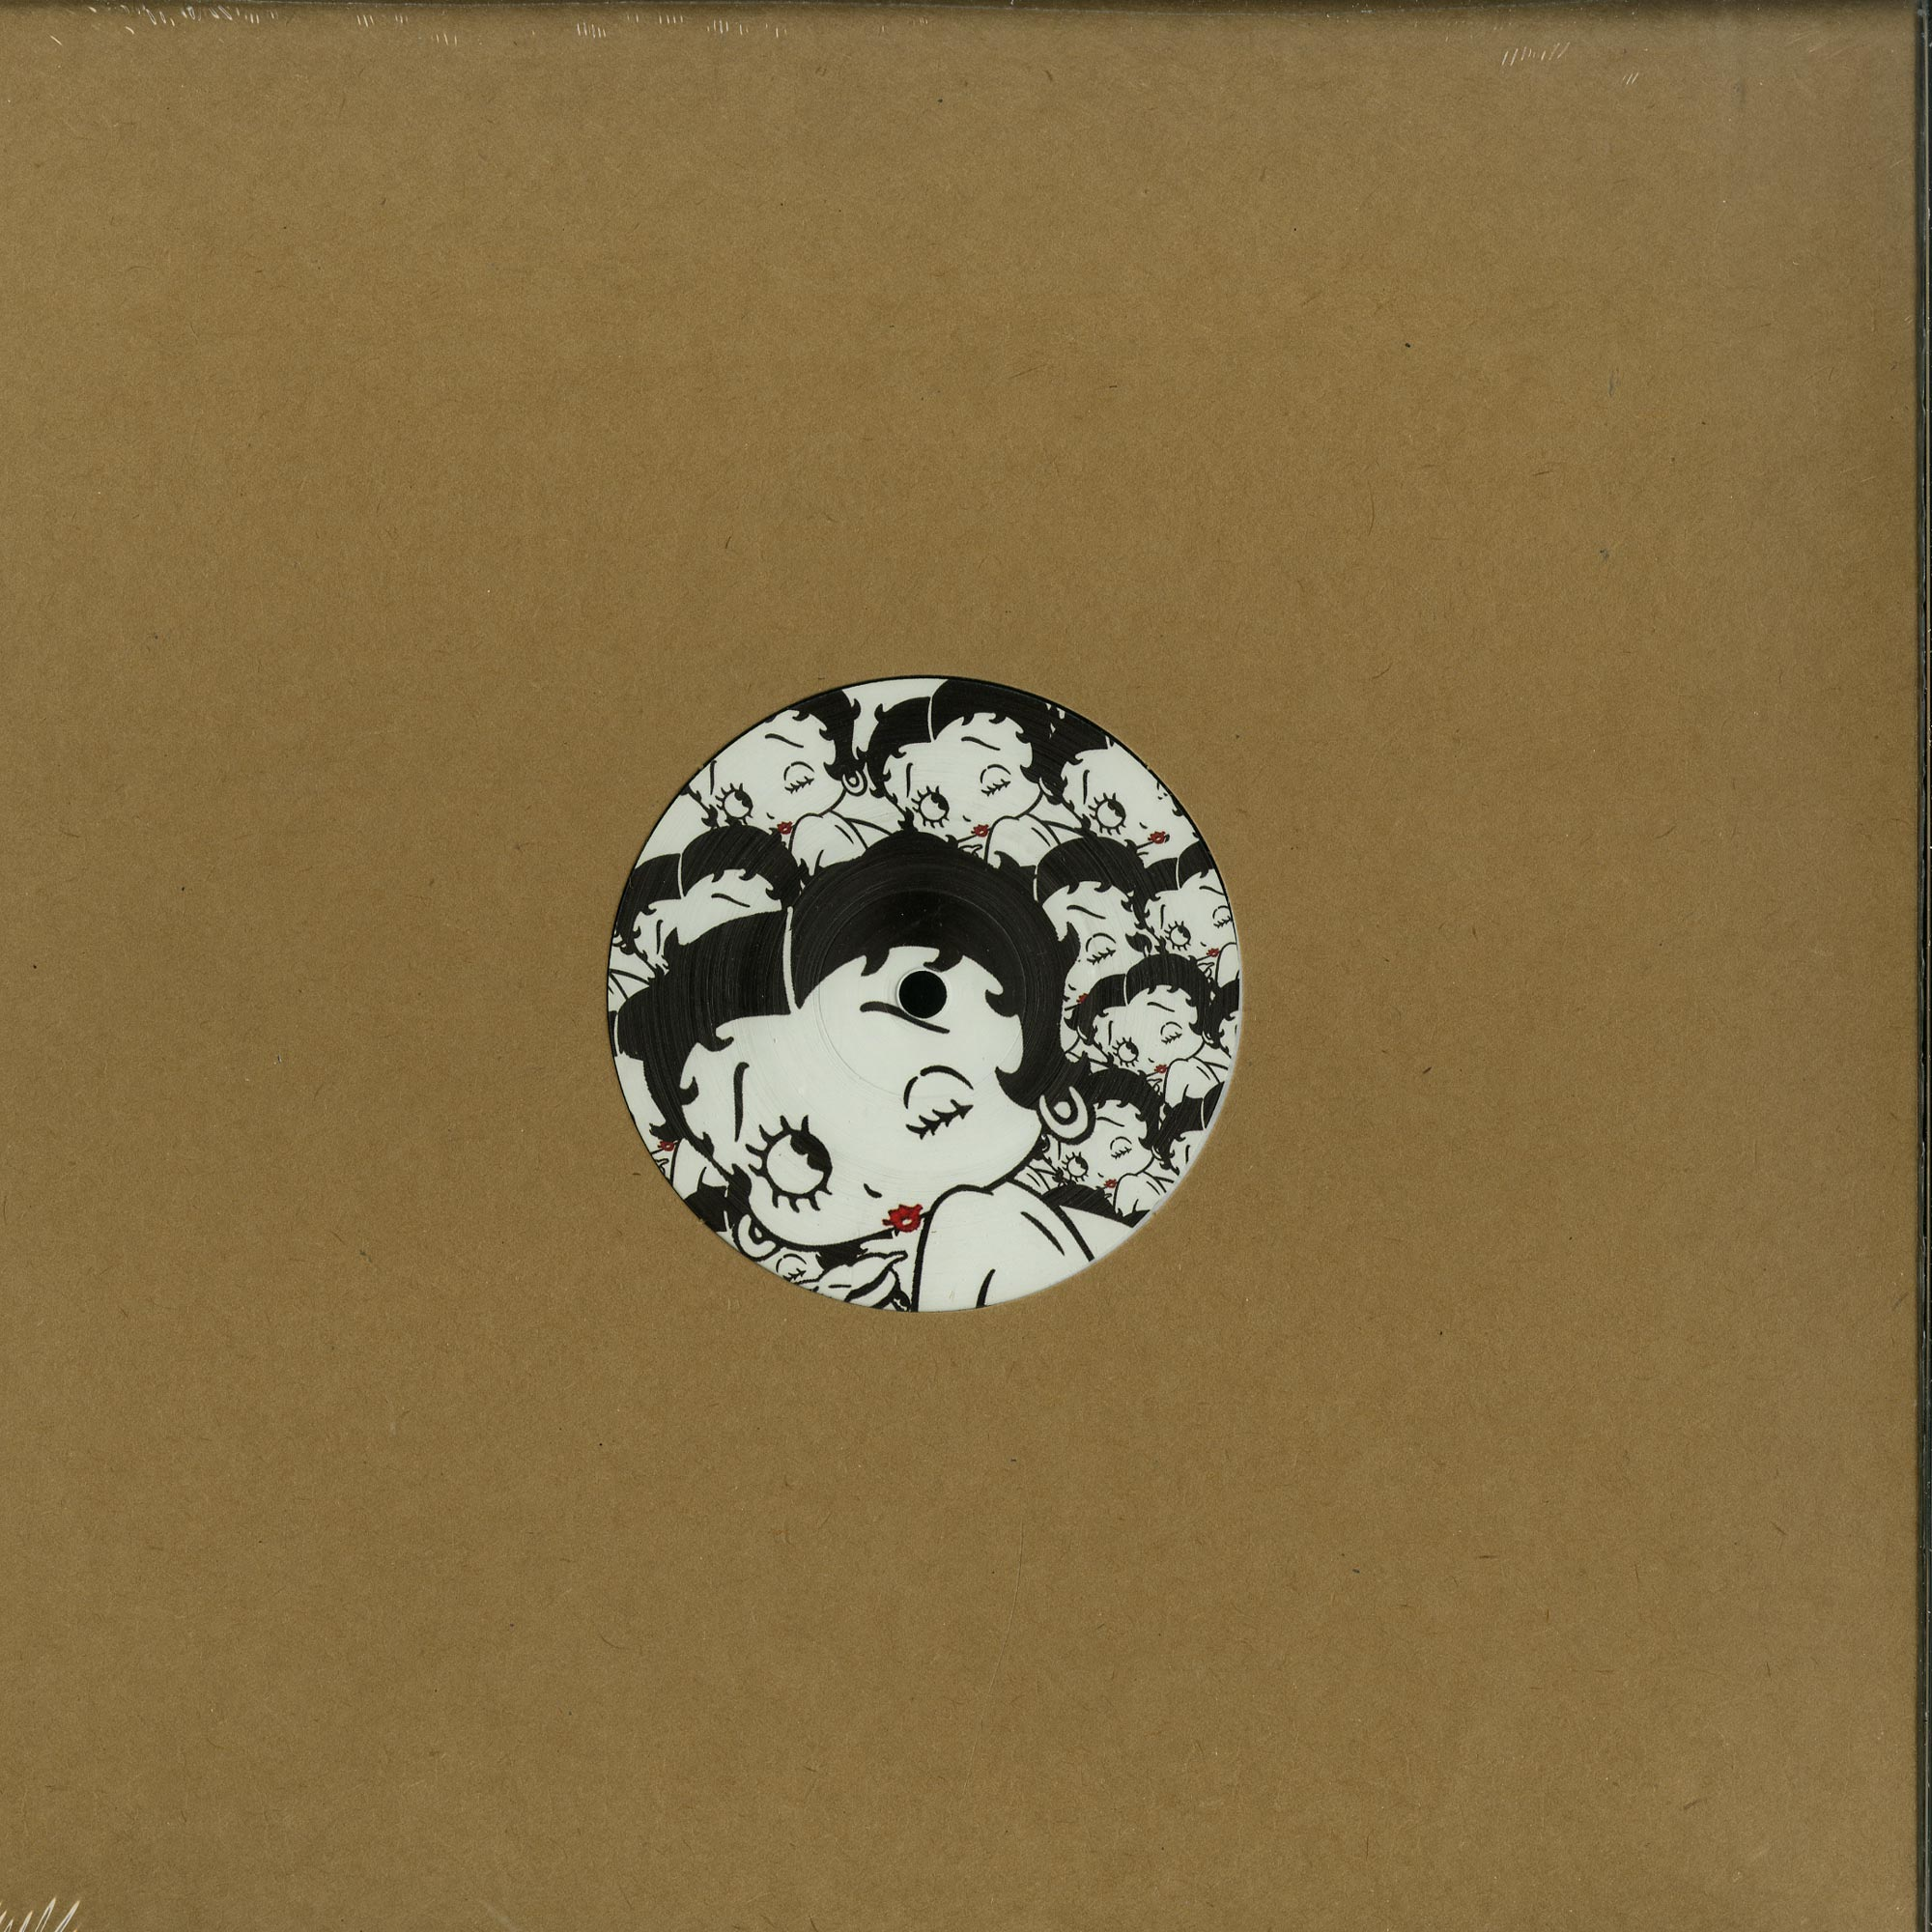 Shanaynay Lindqvist - CRAZY BOOTY DISCOTEQUE EP